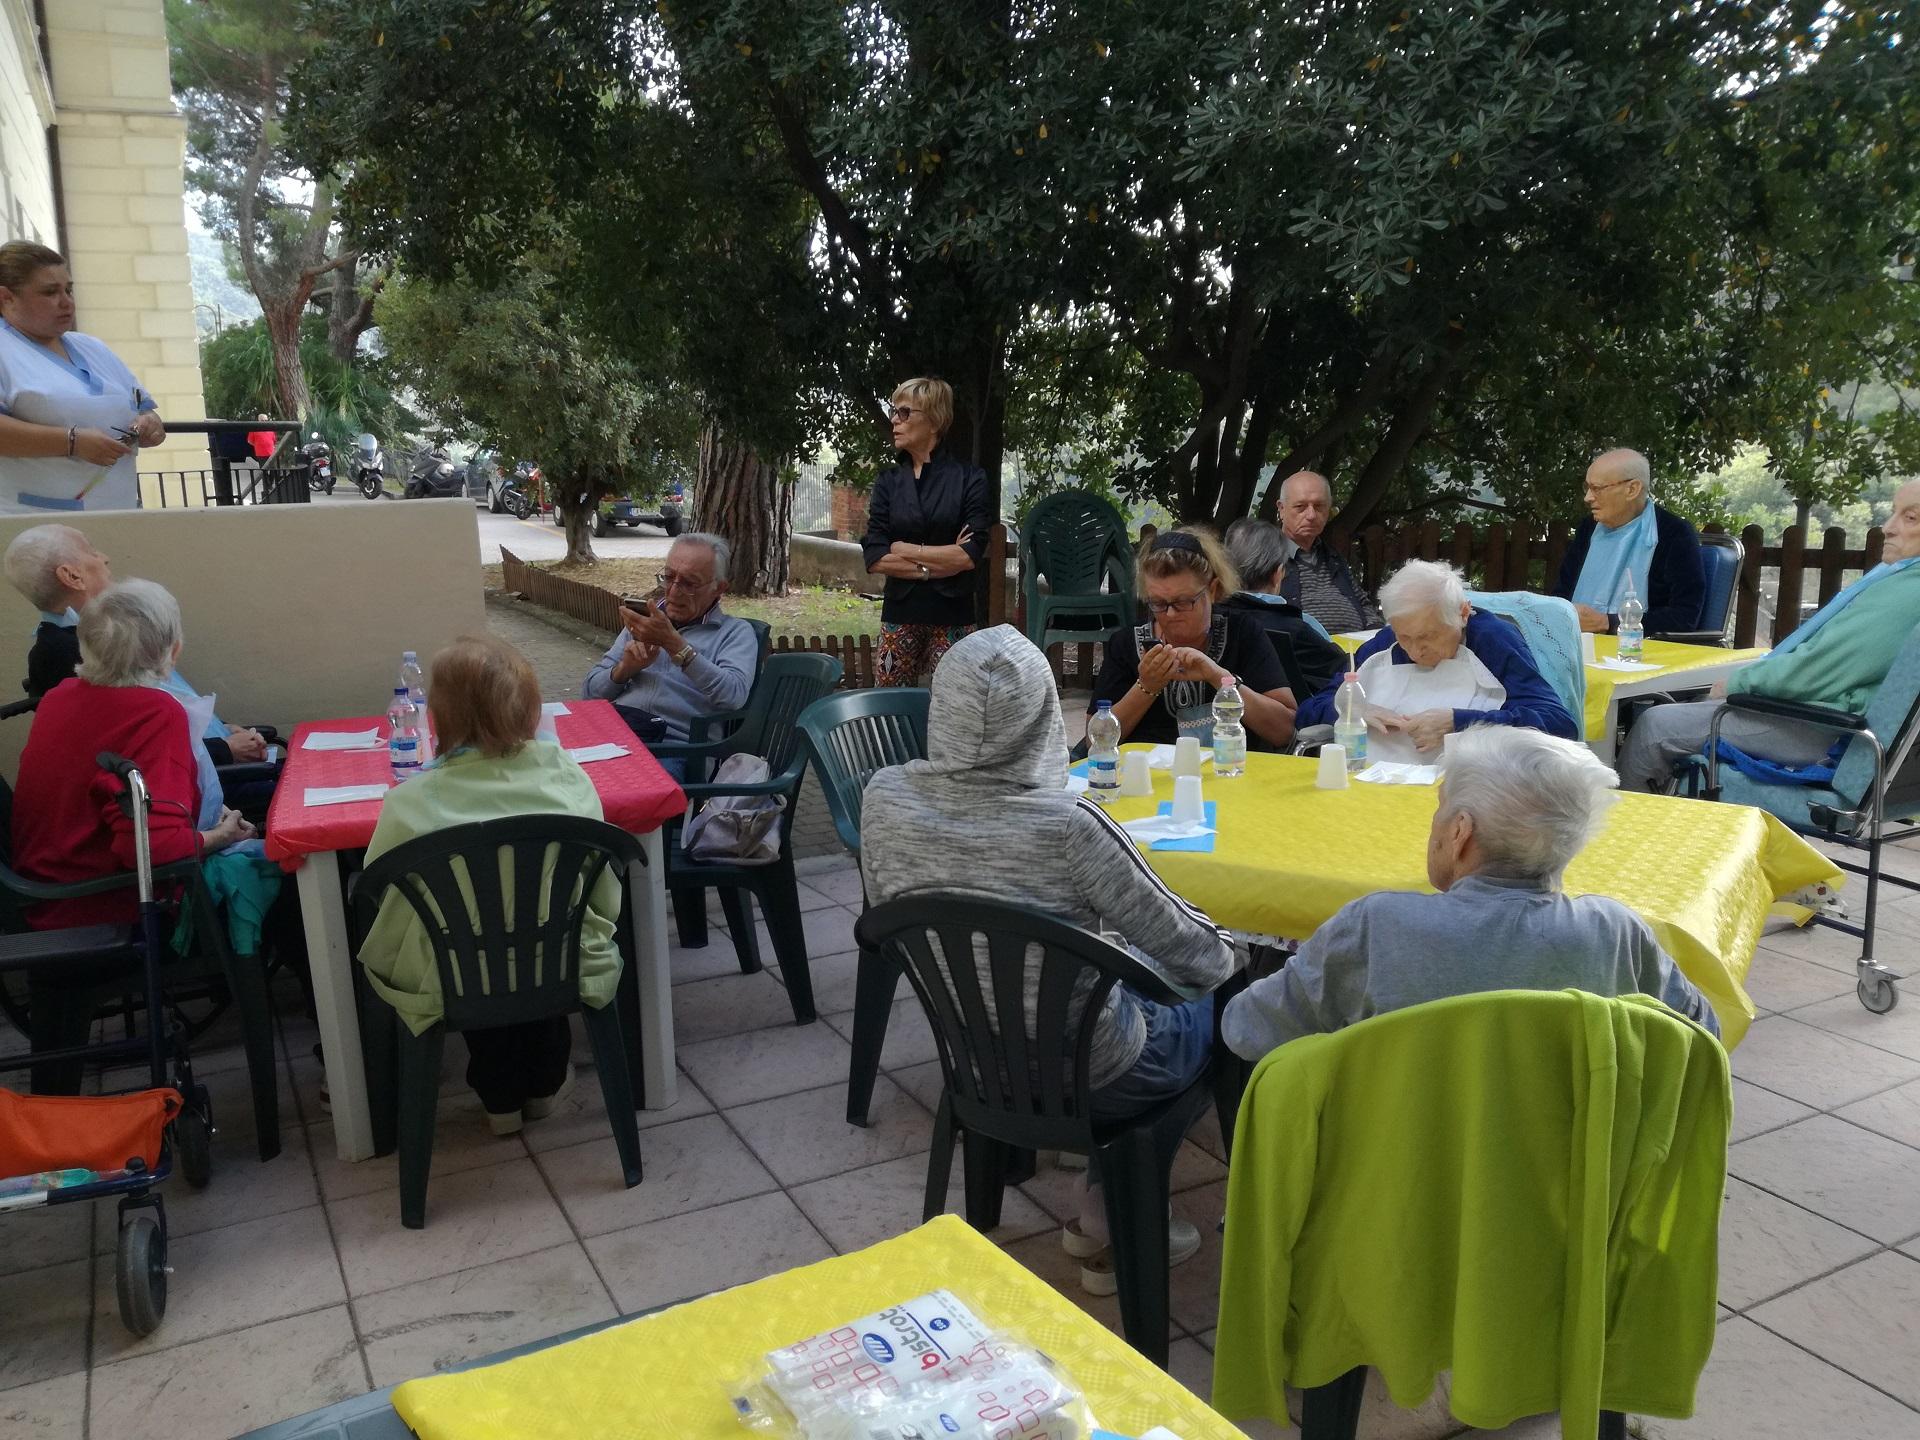 Pranzo in giardino Residenza Sanitaria Assistenziale Noceti - Opere Sociali Servizi Savona